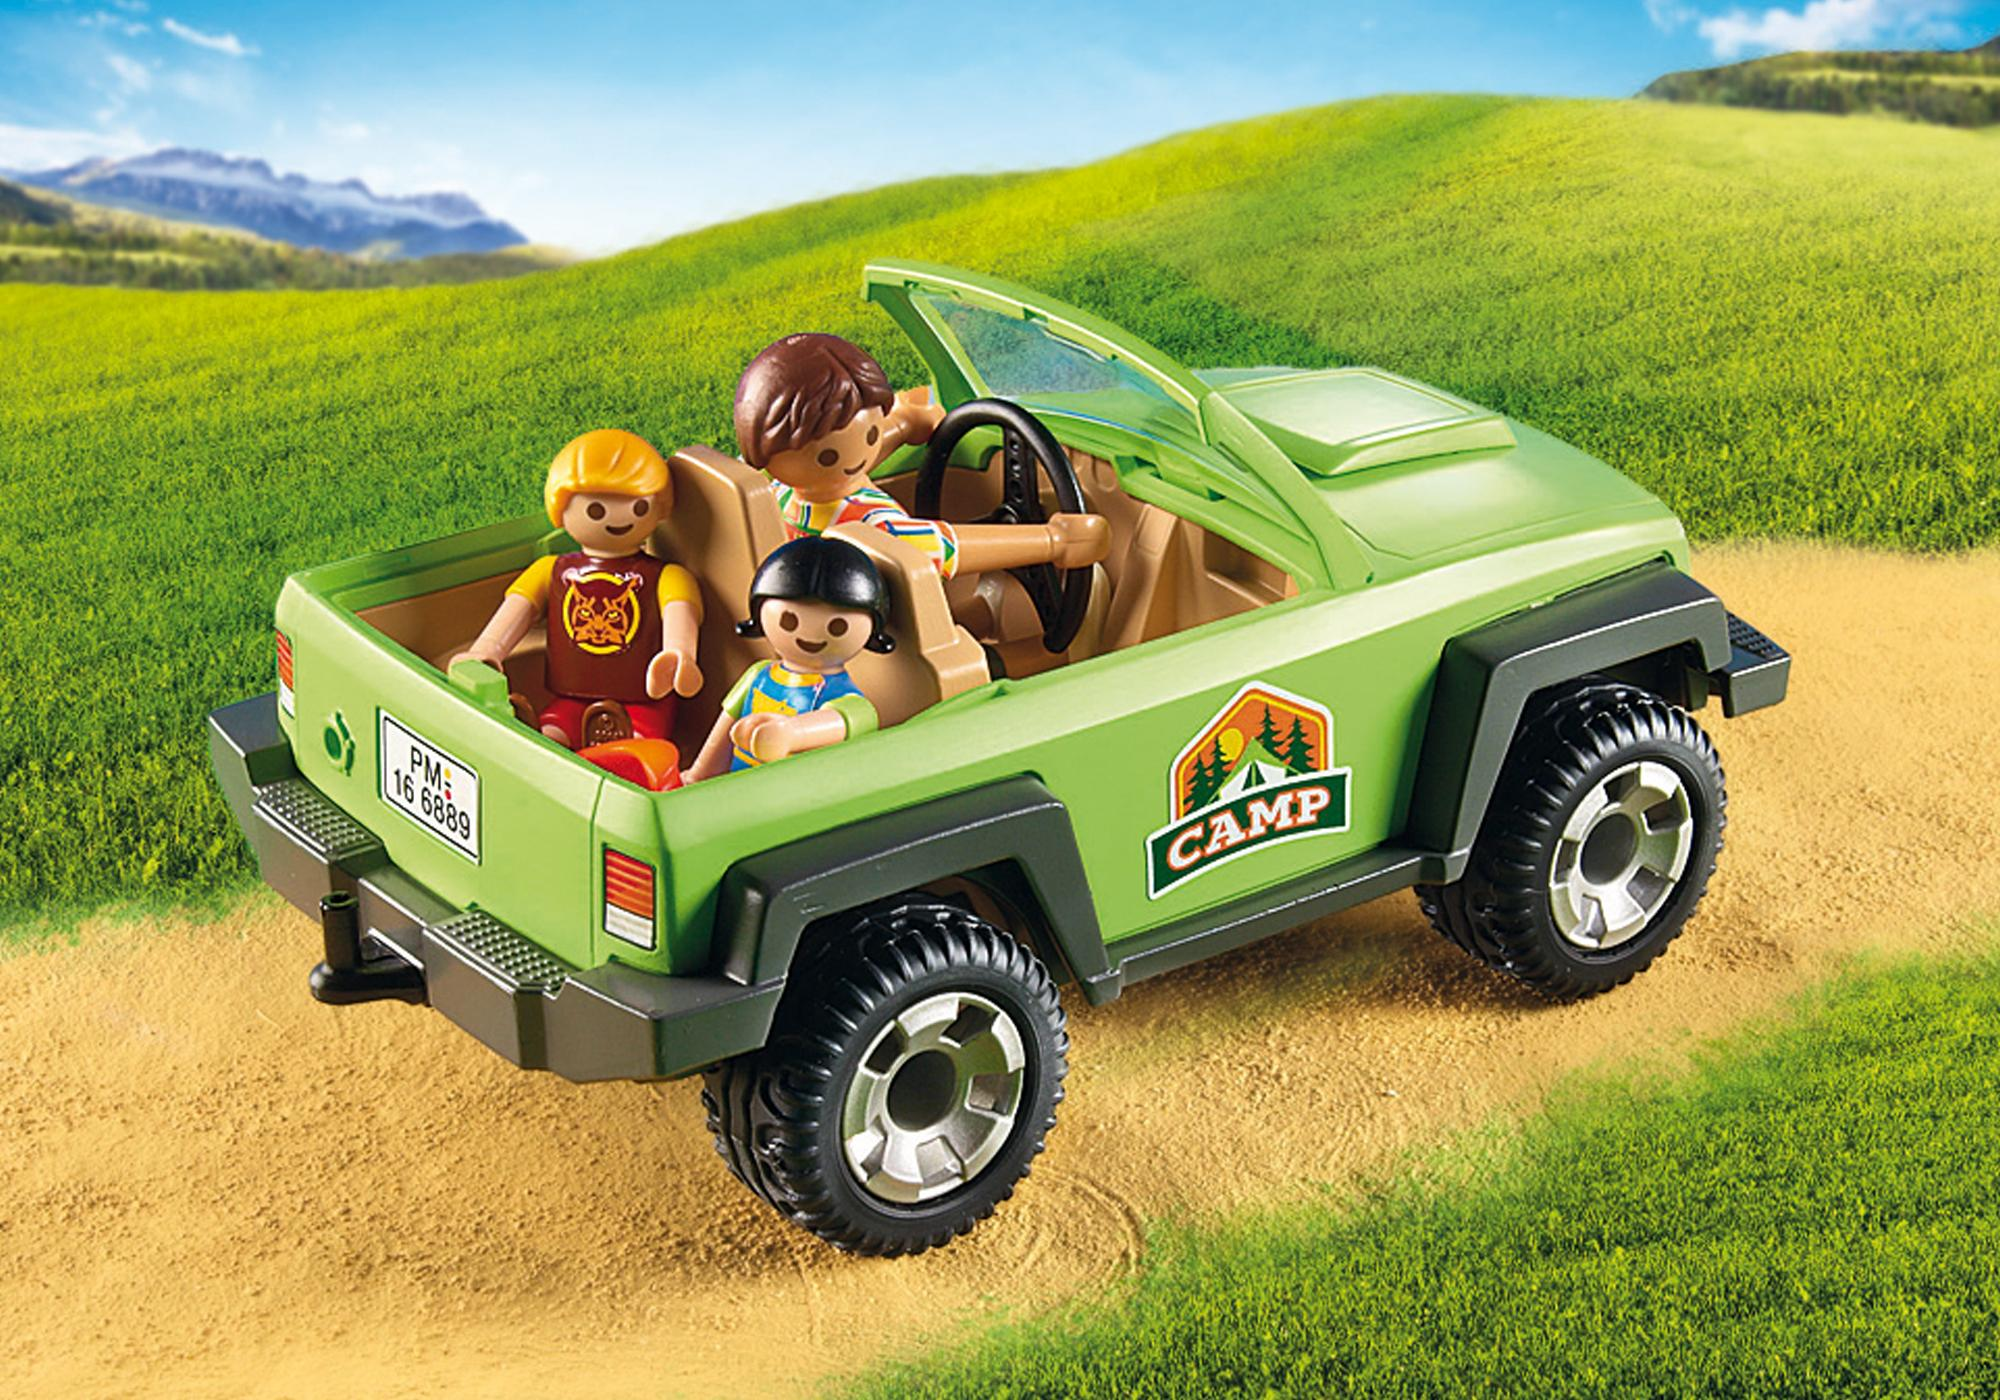 http://media.playmobil.com/i/playmobil/9154_product_extra2/Off-Road SUV